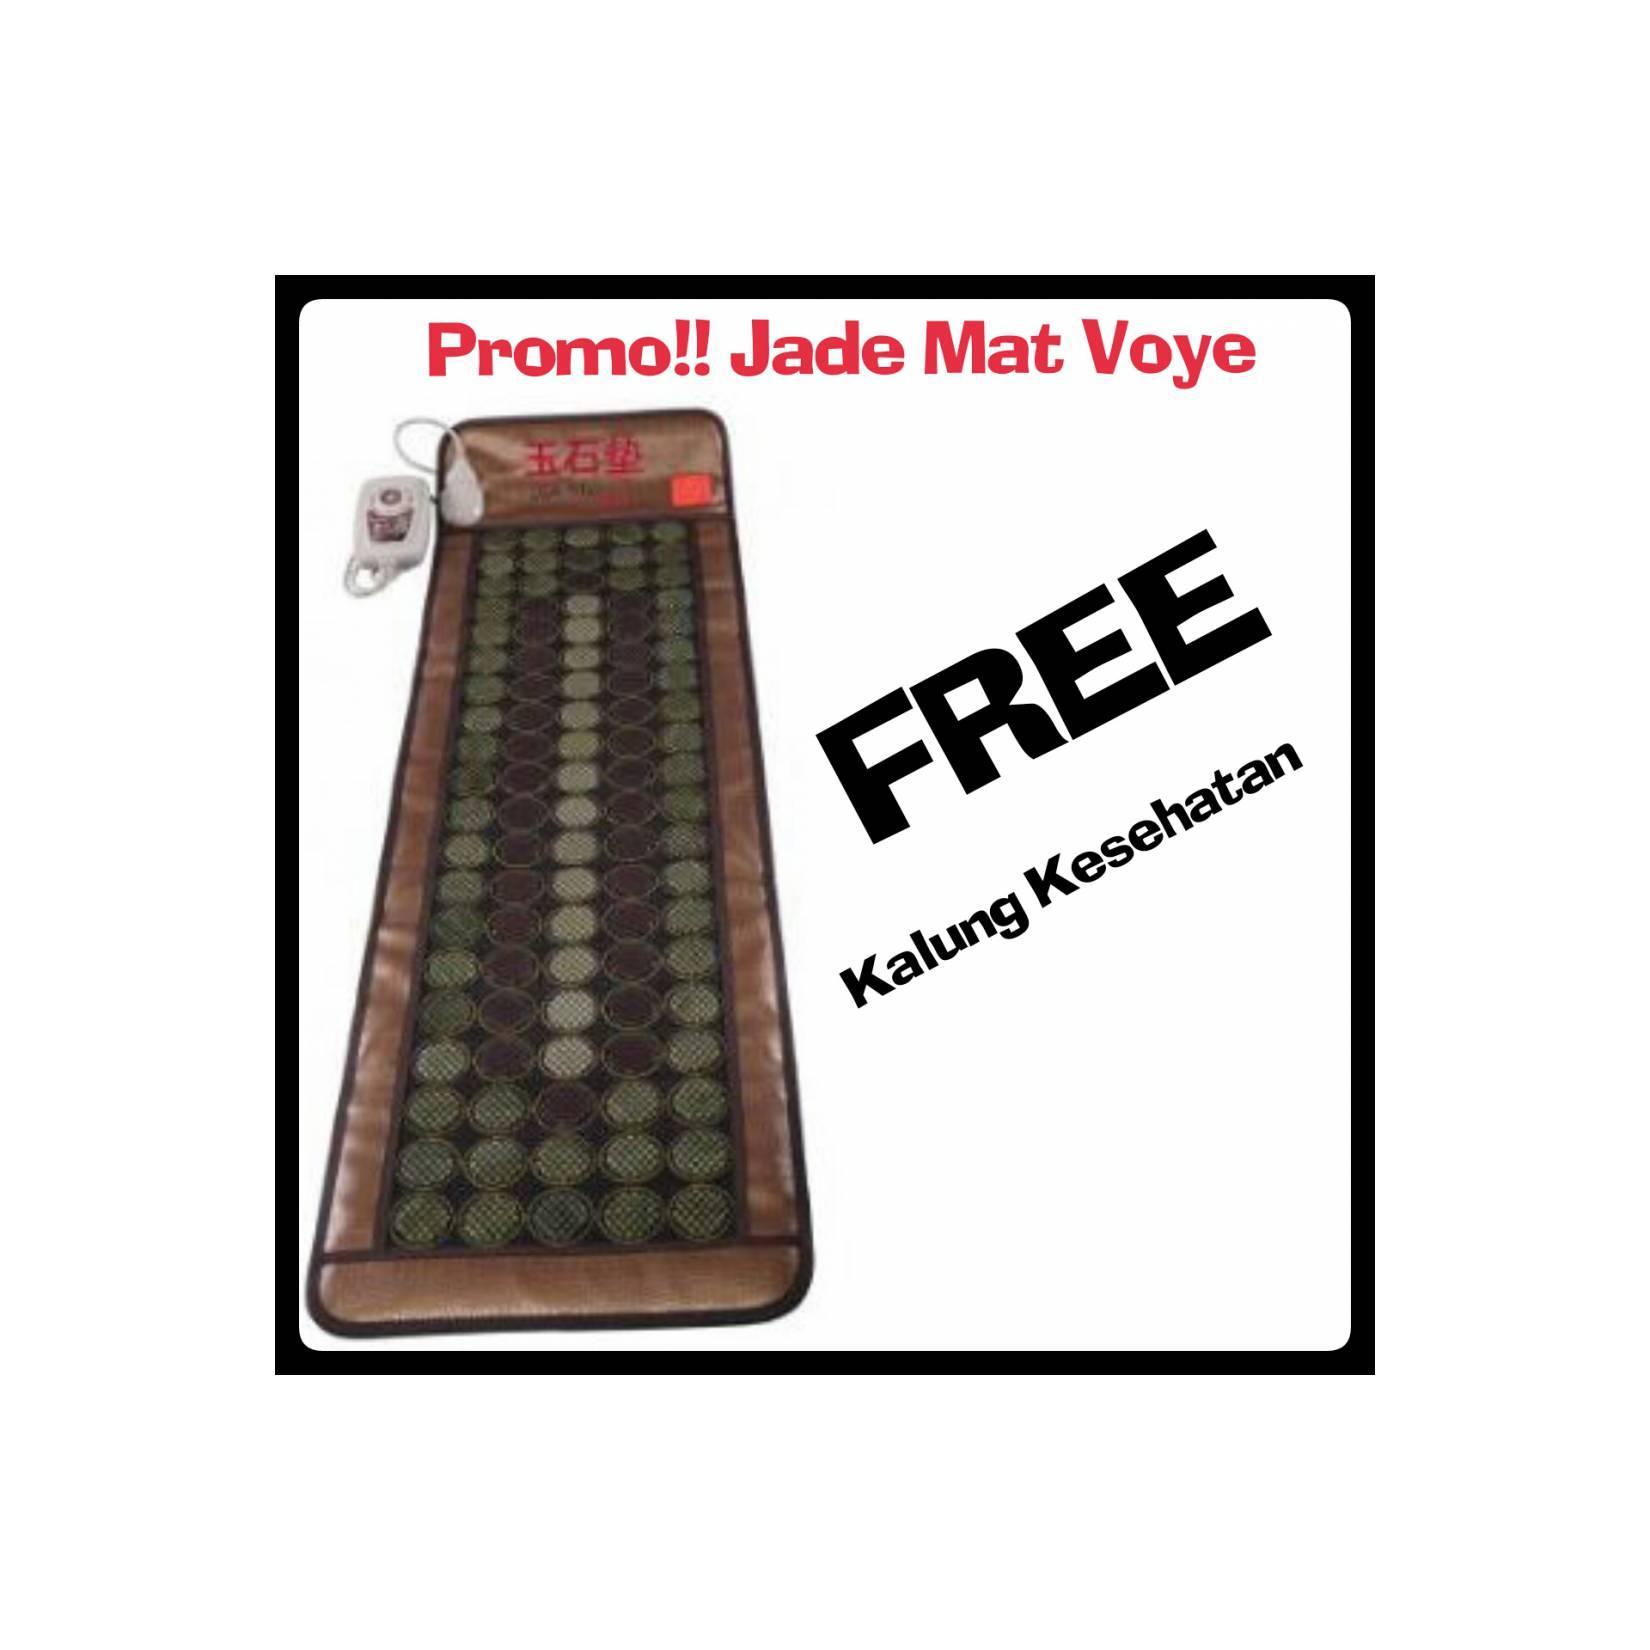 Jade Mat Voye Matras Terapi Kesehatan Daftar Harga Terlengkap Kasur Mengandung Batu Tourmaline Free Kalung Kesehatanidr4318400 Rp 4318